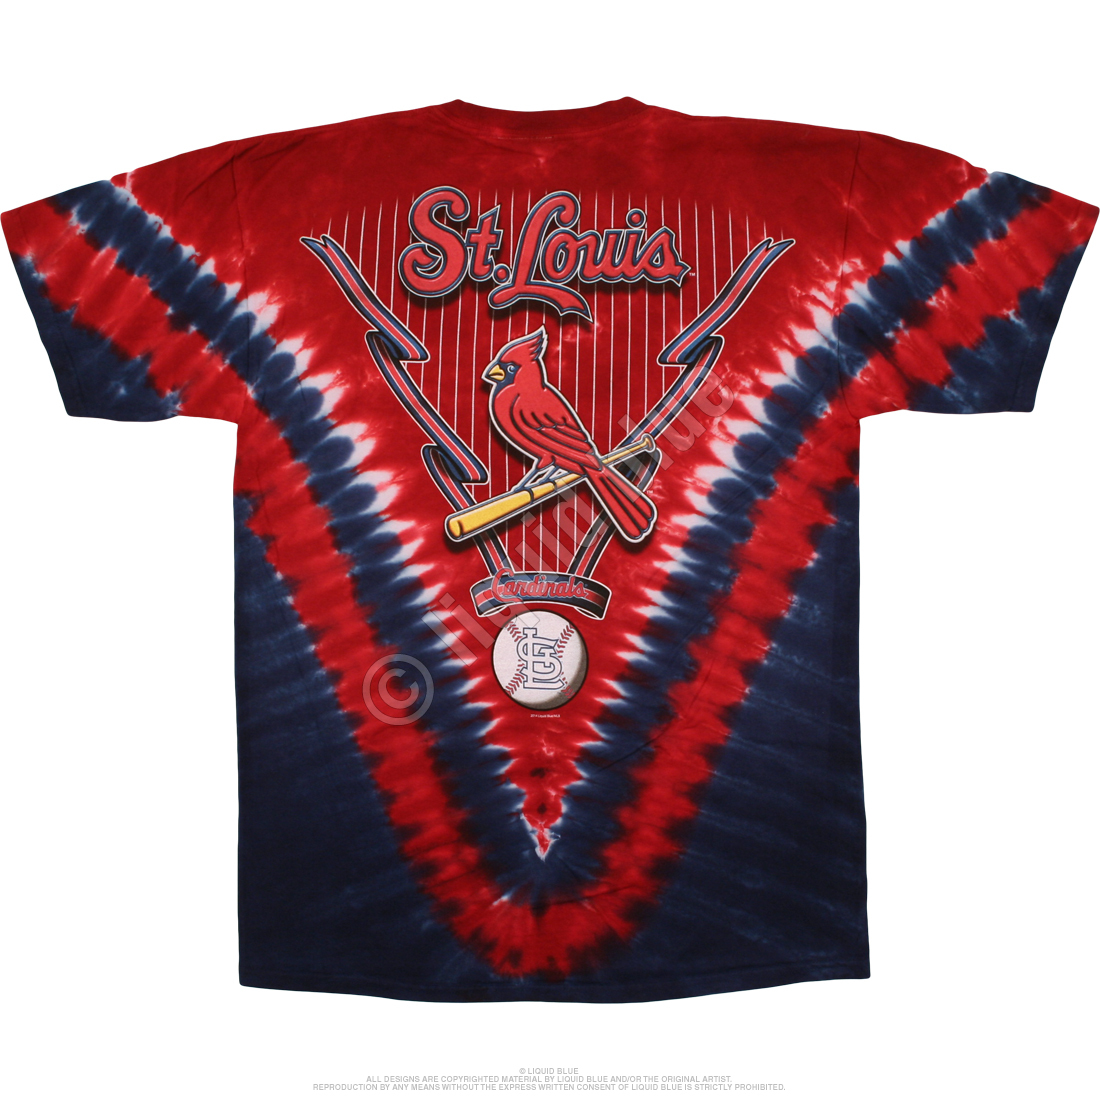 St. Louis Cardinals V Tie-Dye T-Shirt